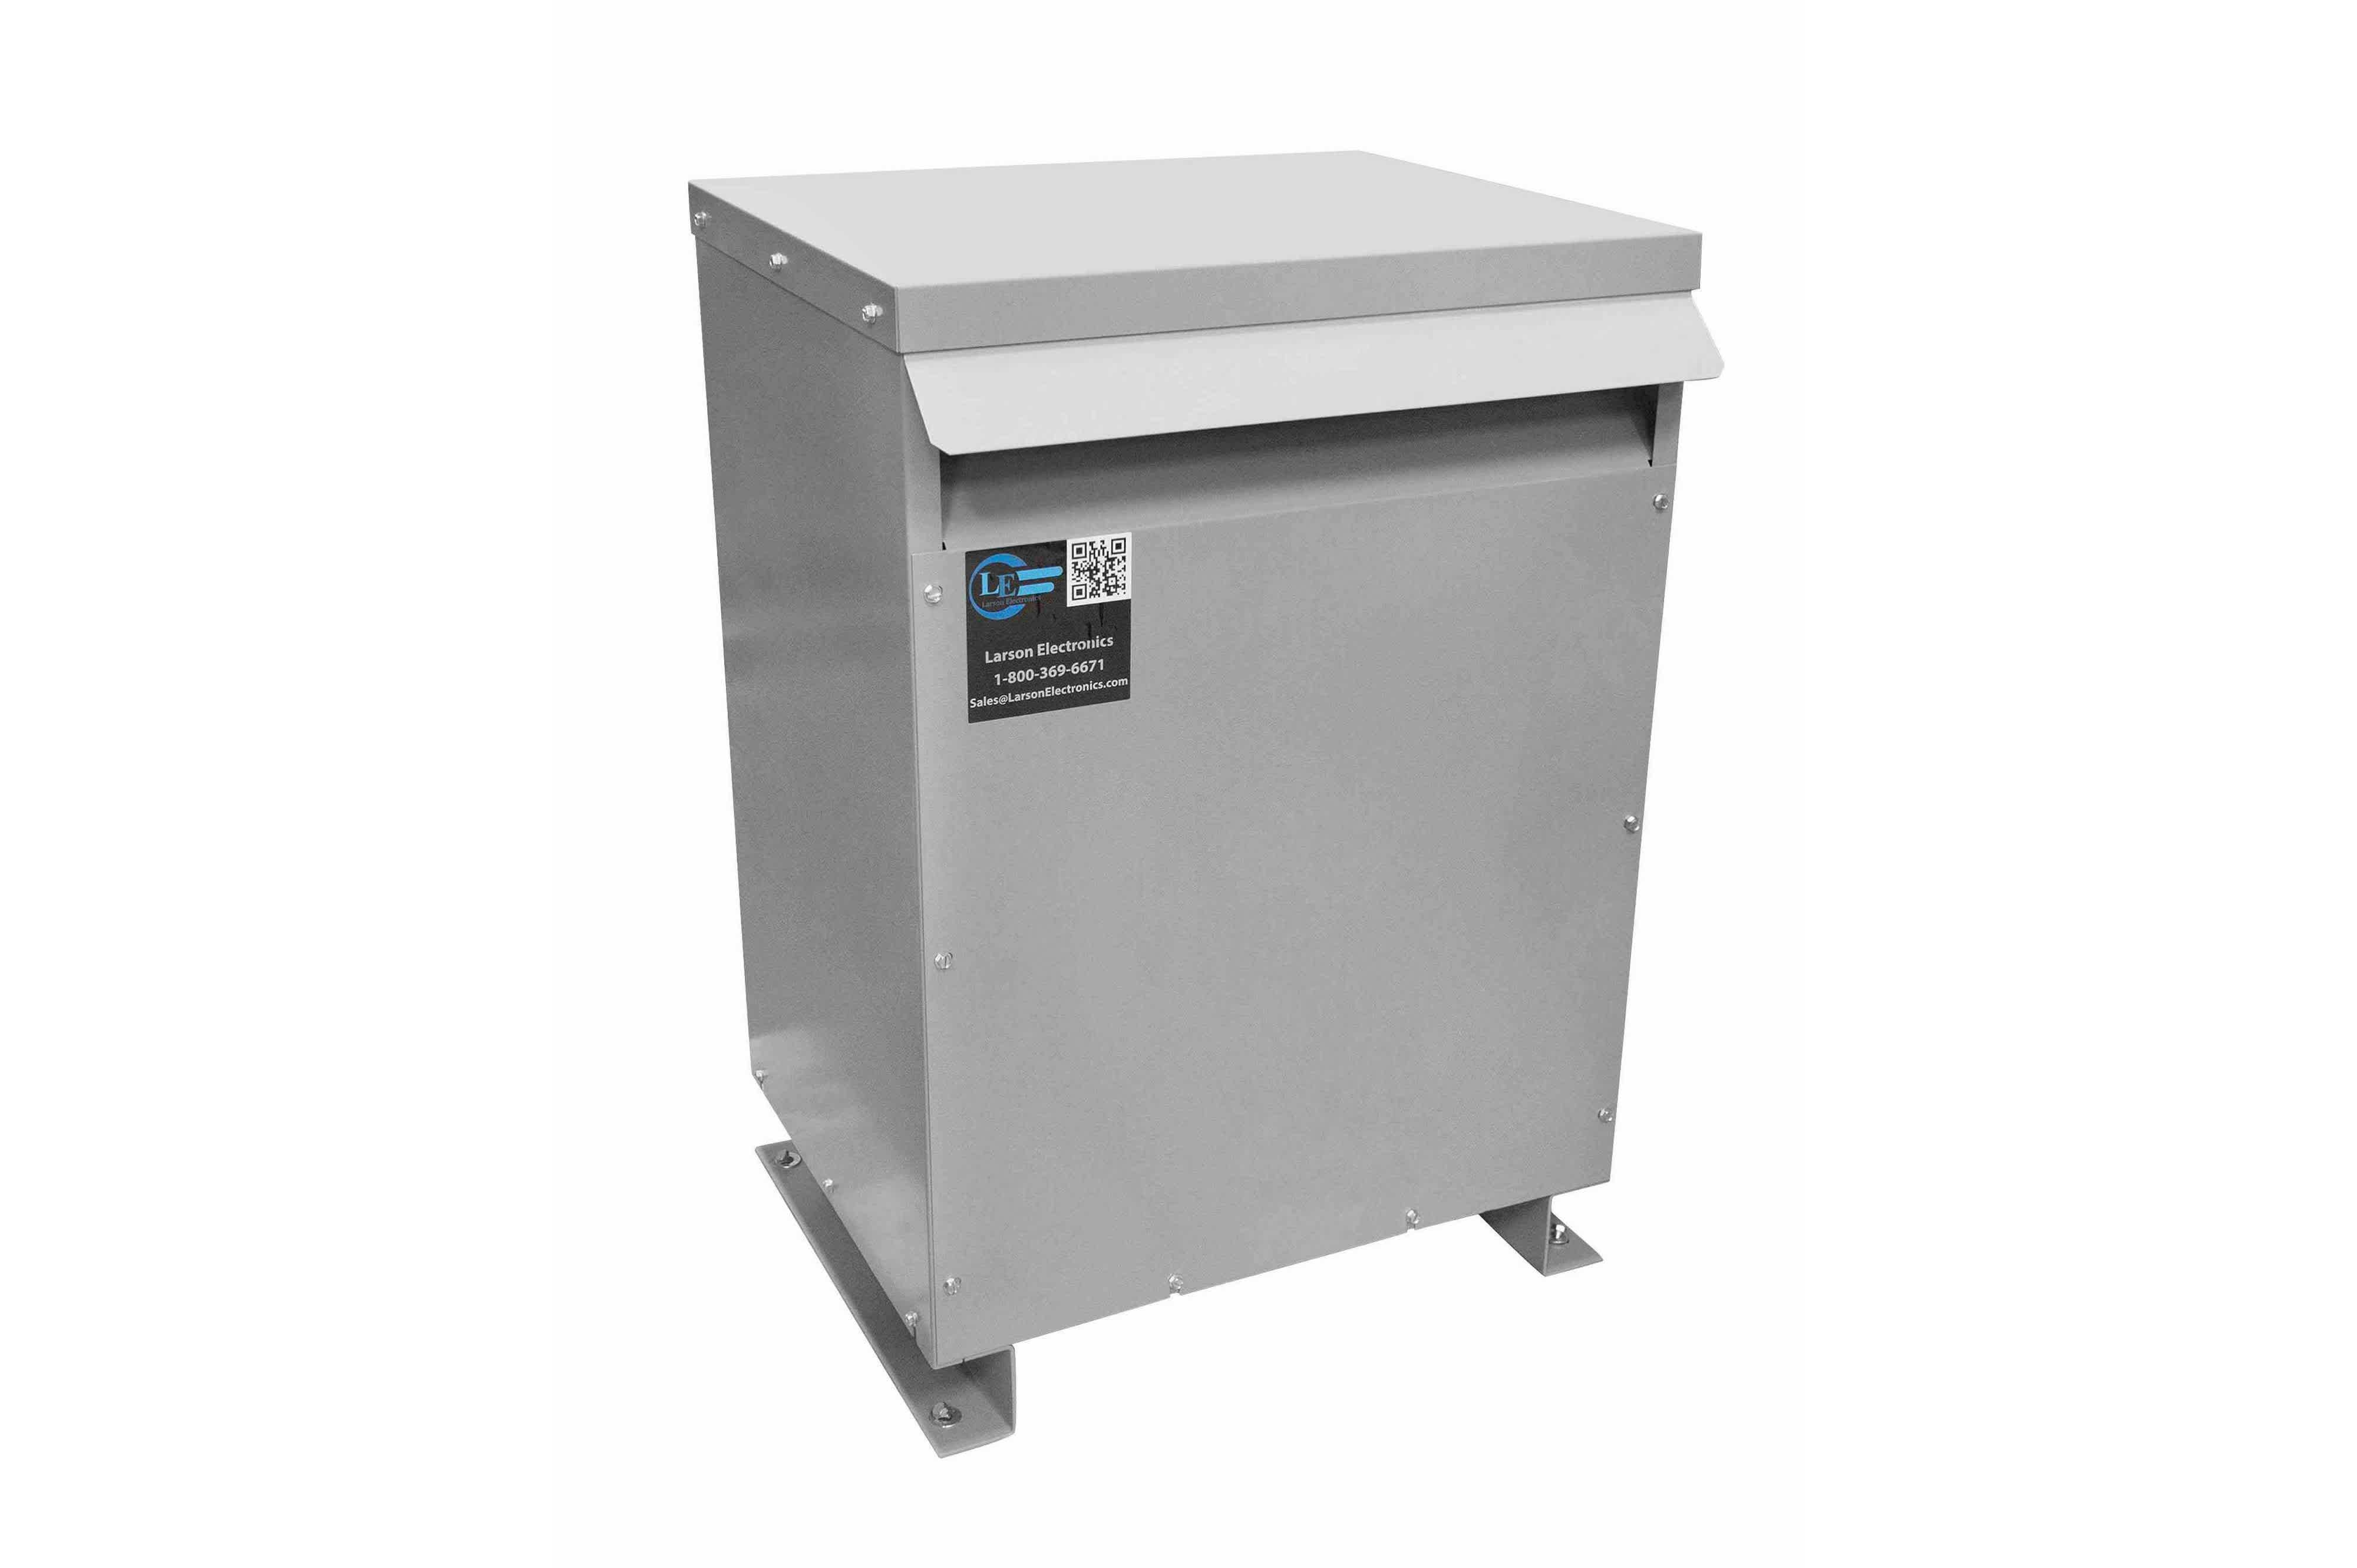 28 kVA 3PH Isolation Transformer, 480V Wye Primary, 575Y/332 Wye-N Secondary, N3R, Ventilated, 60 Hz